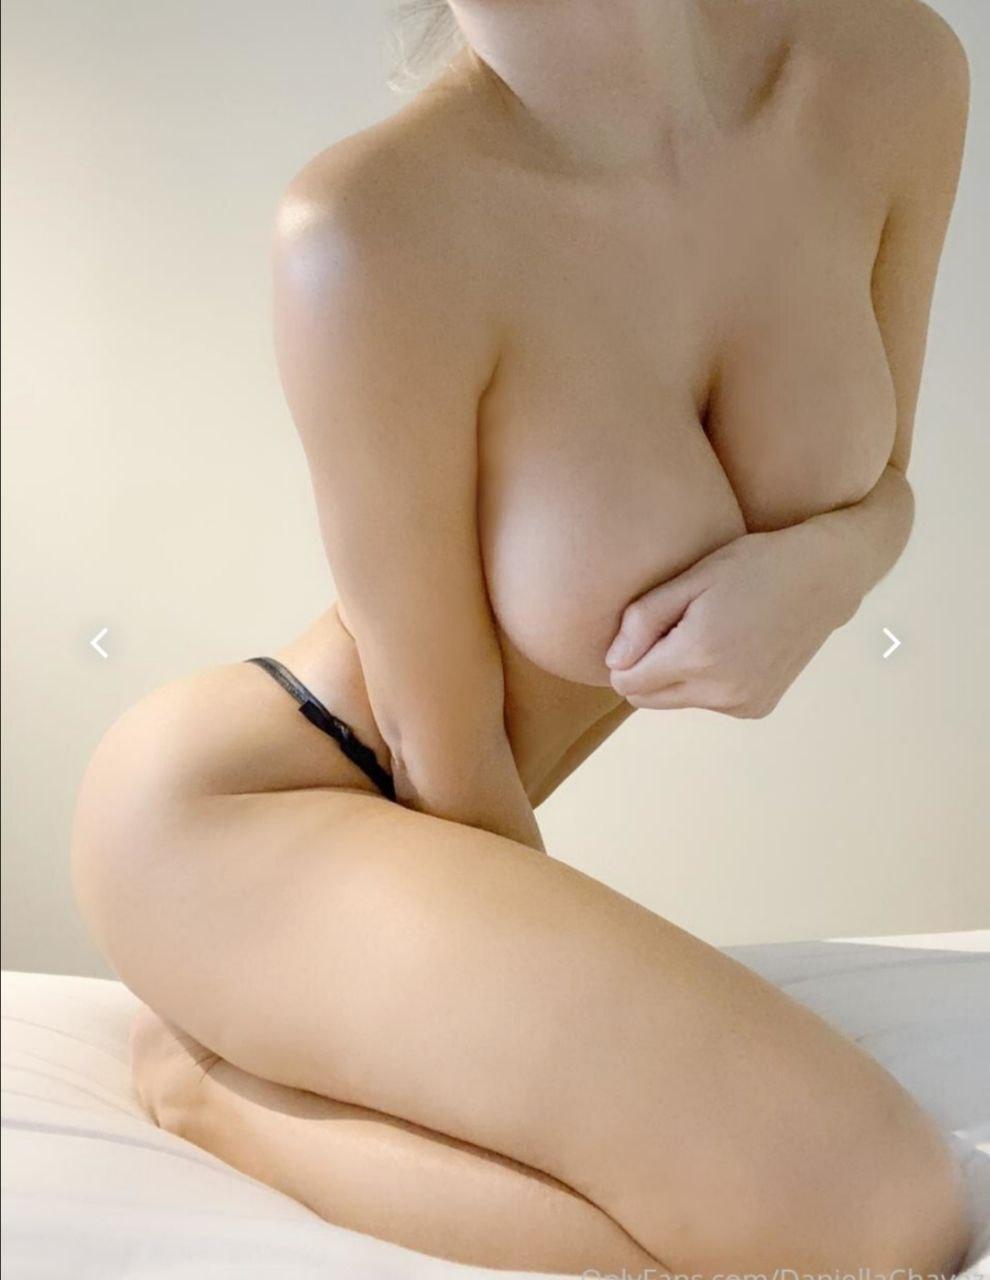 https://images2.imgbox.com/9f/f4/sDOuwg4s_o.jpg